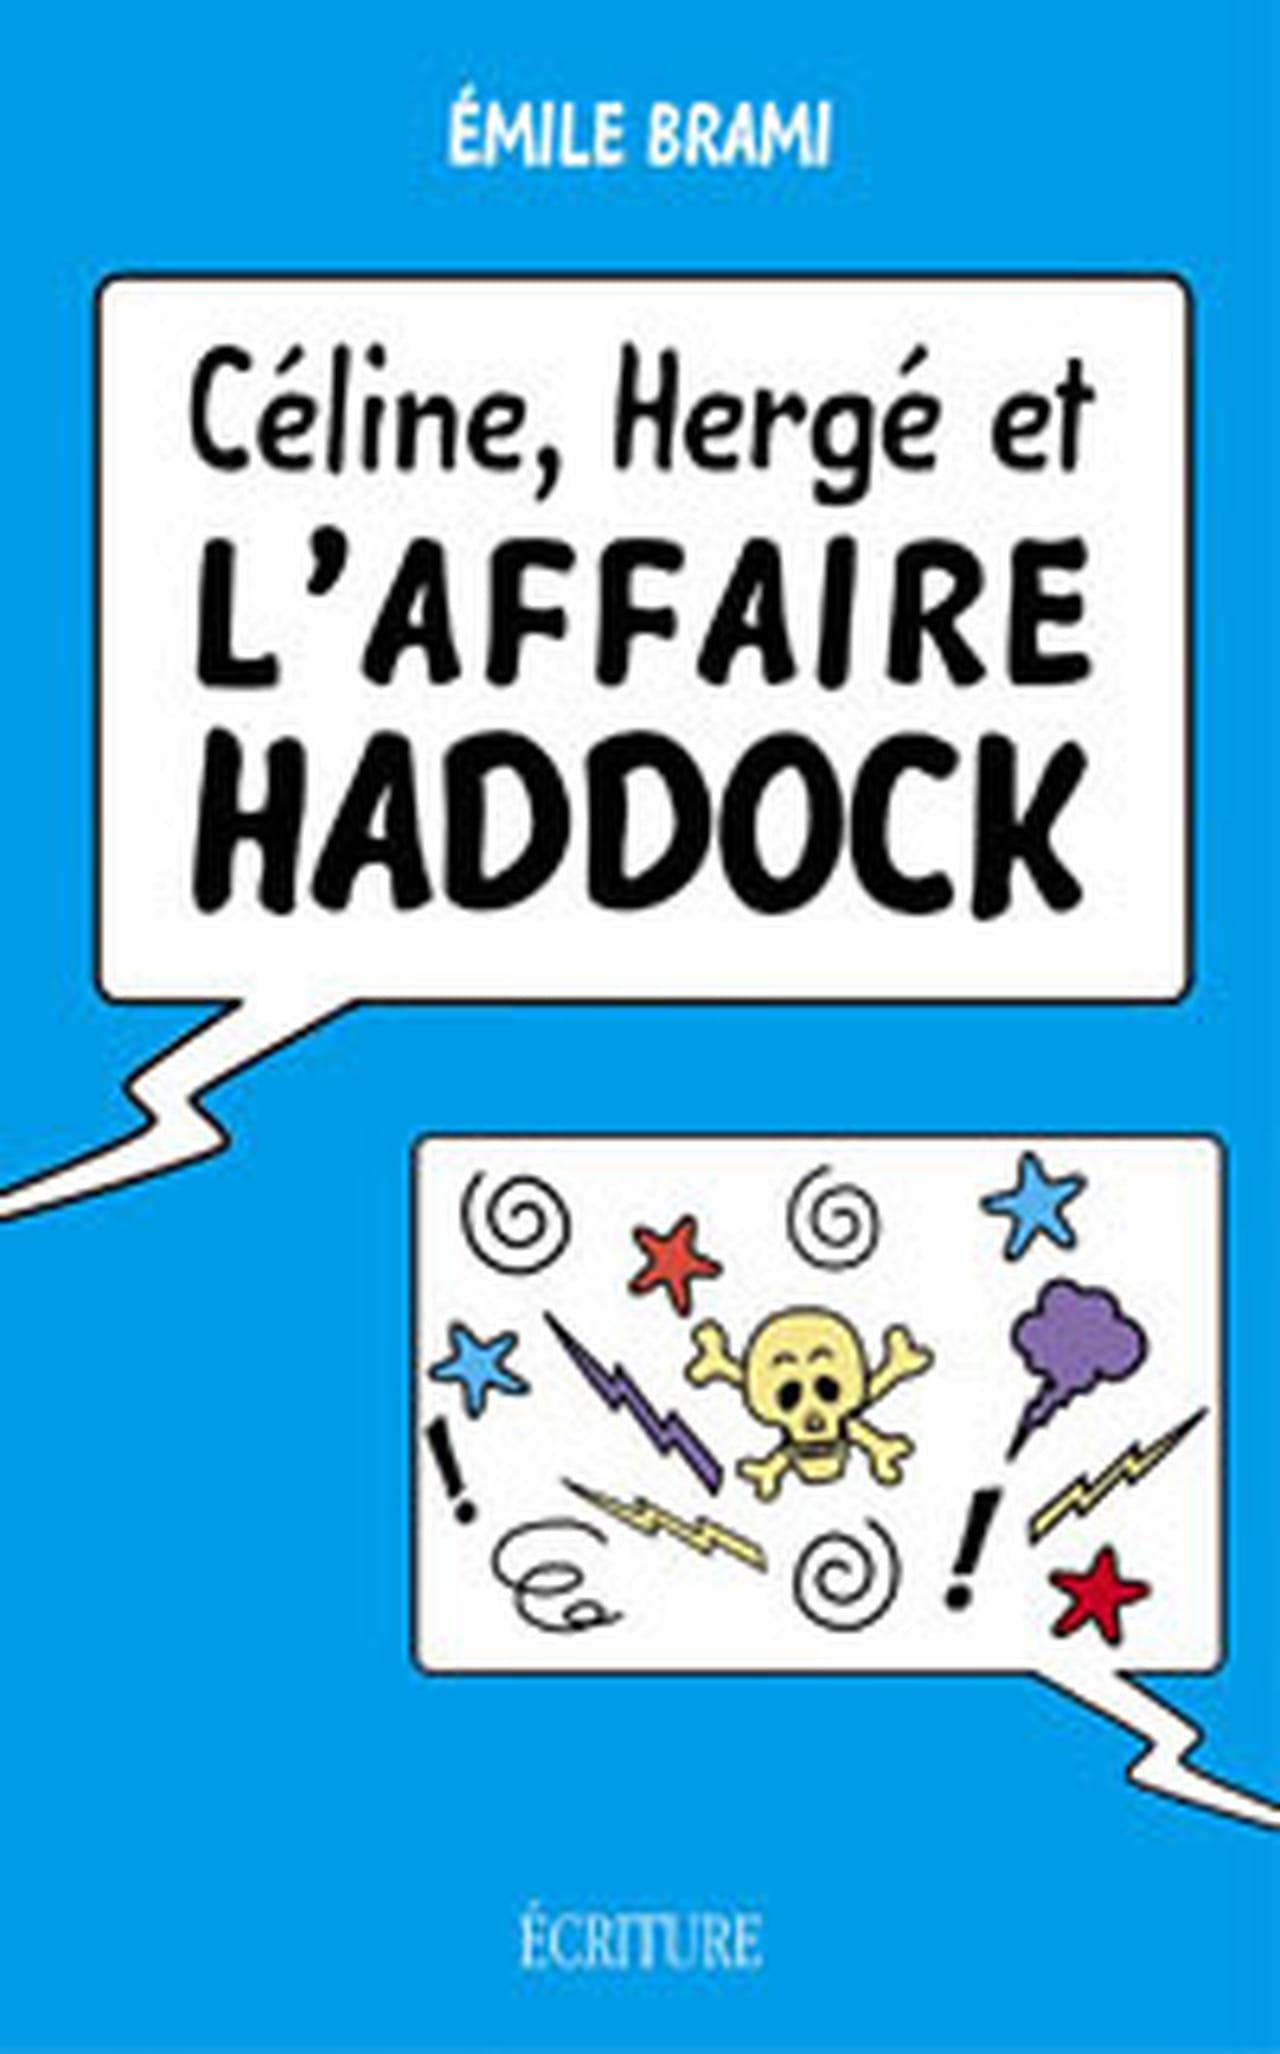 ou tintin rencontre haddock